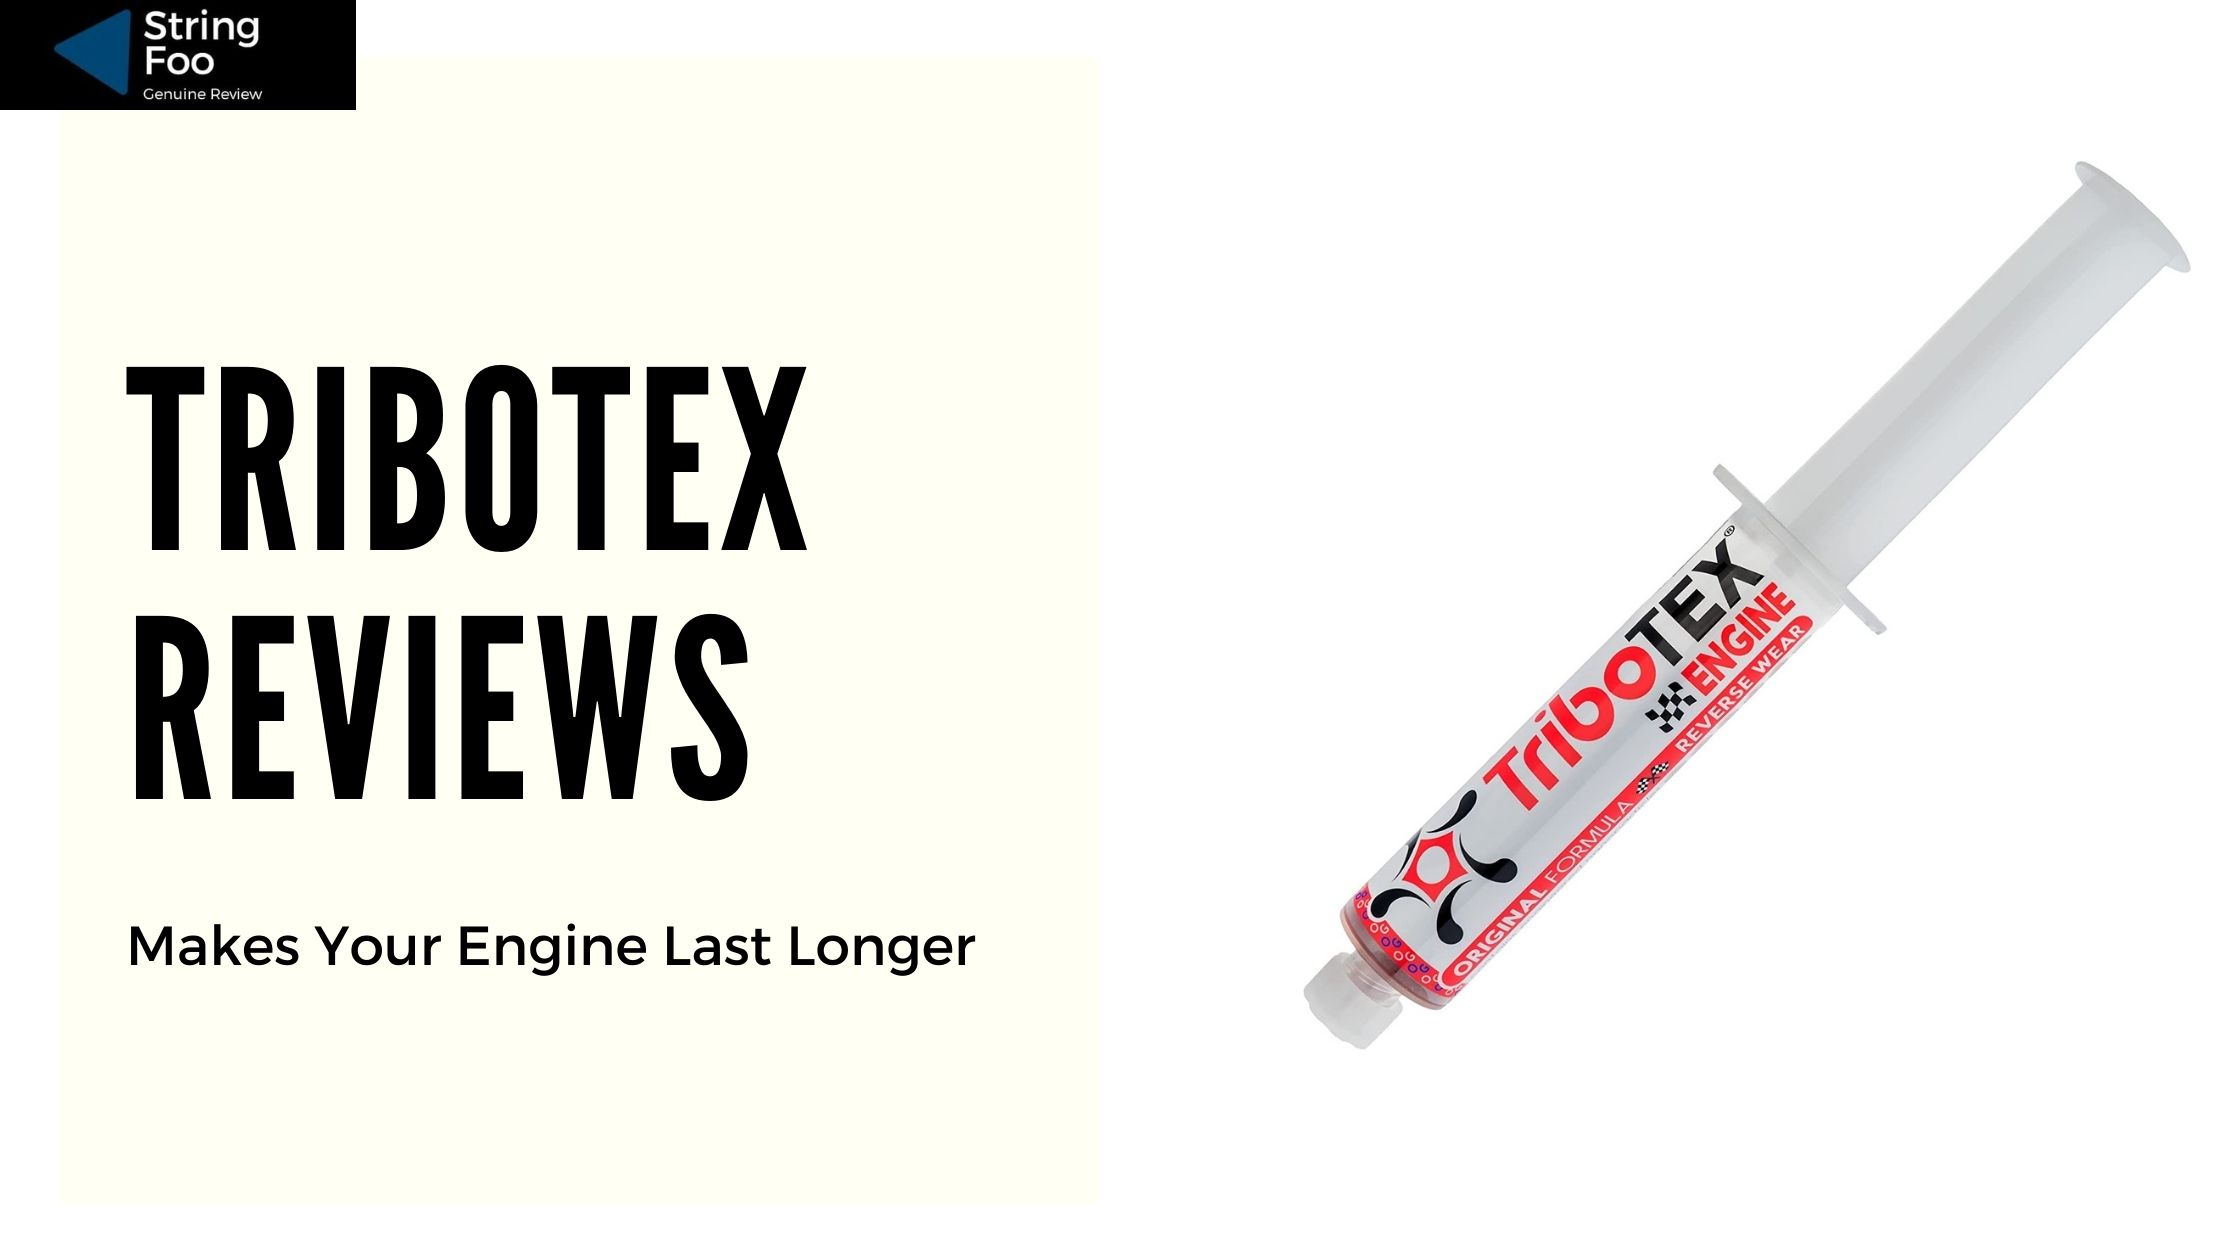 Tribotex Reviews